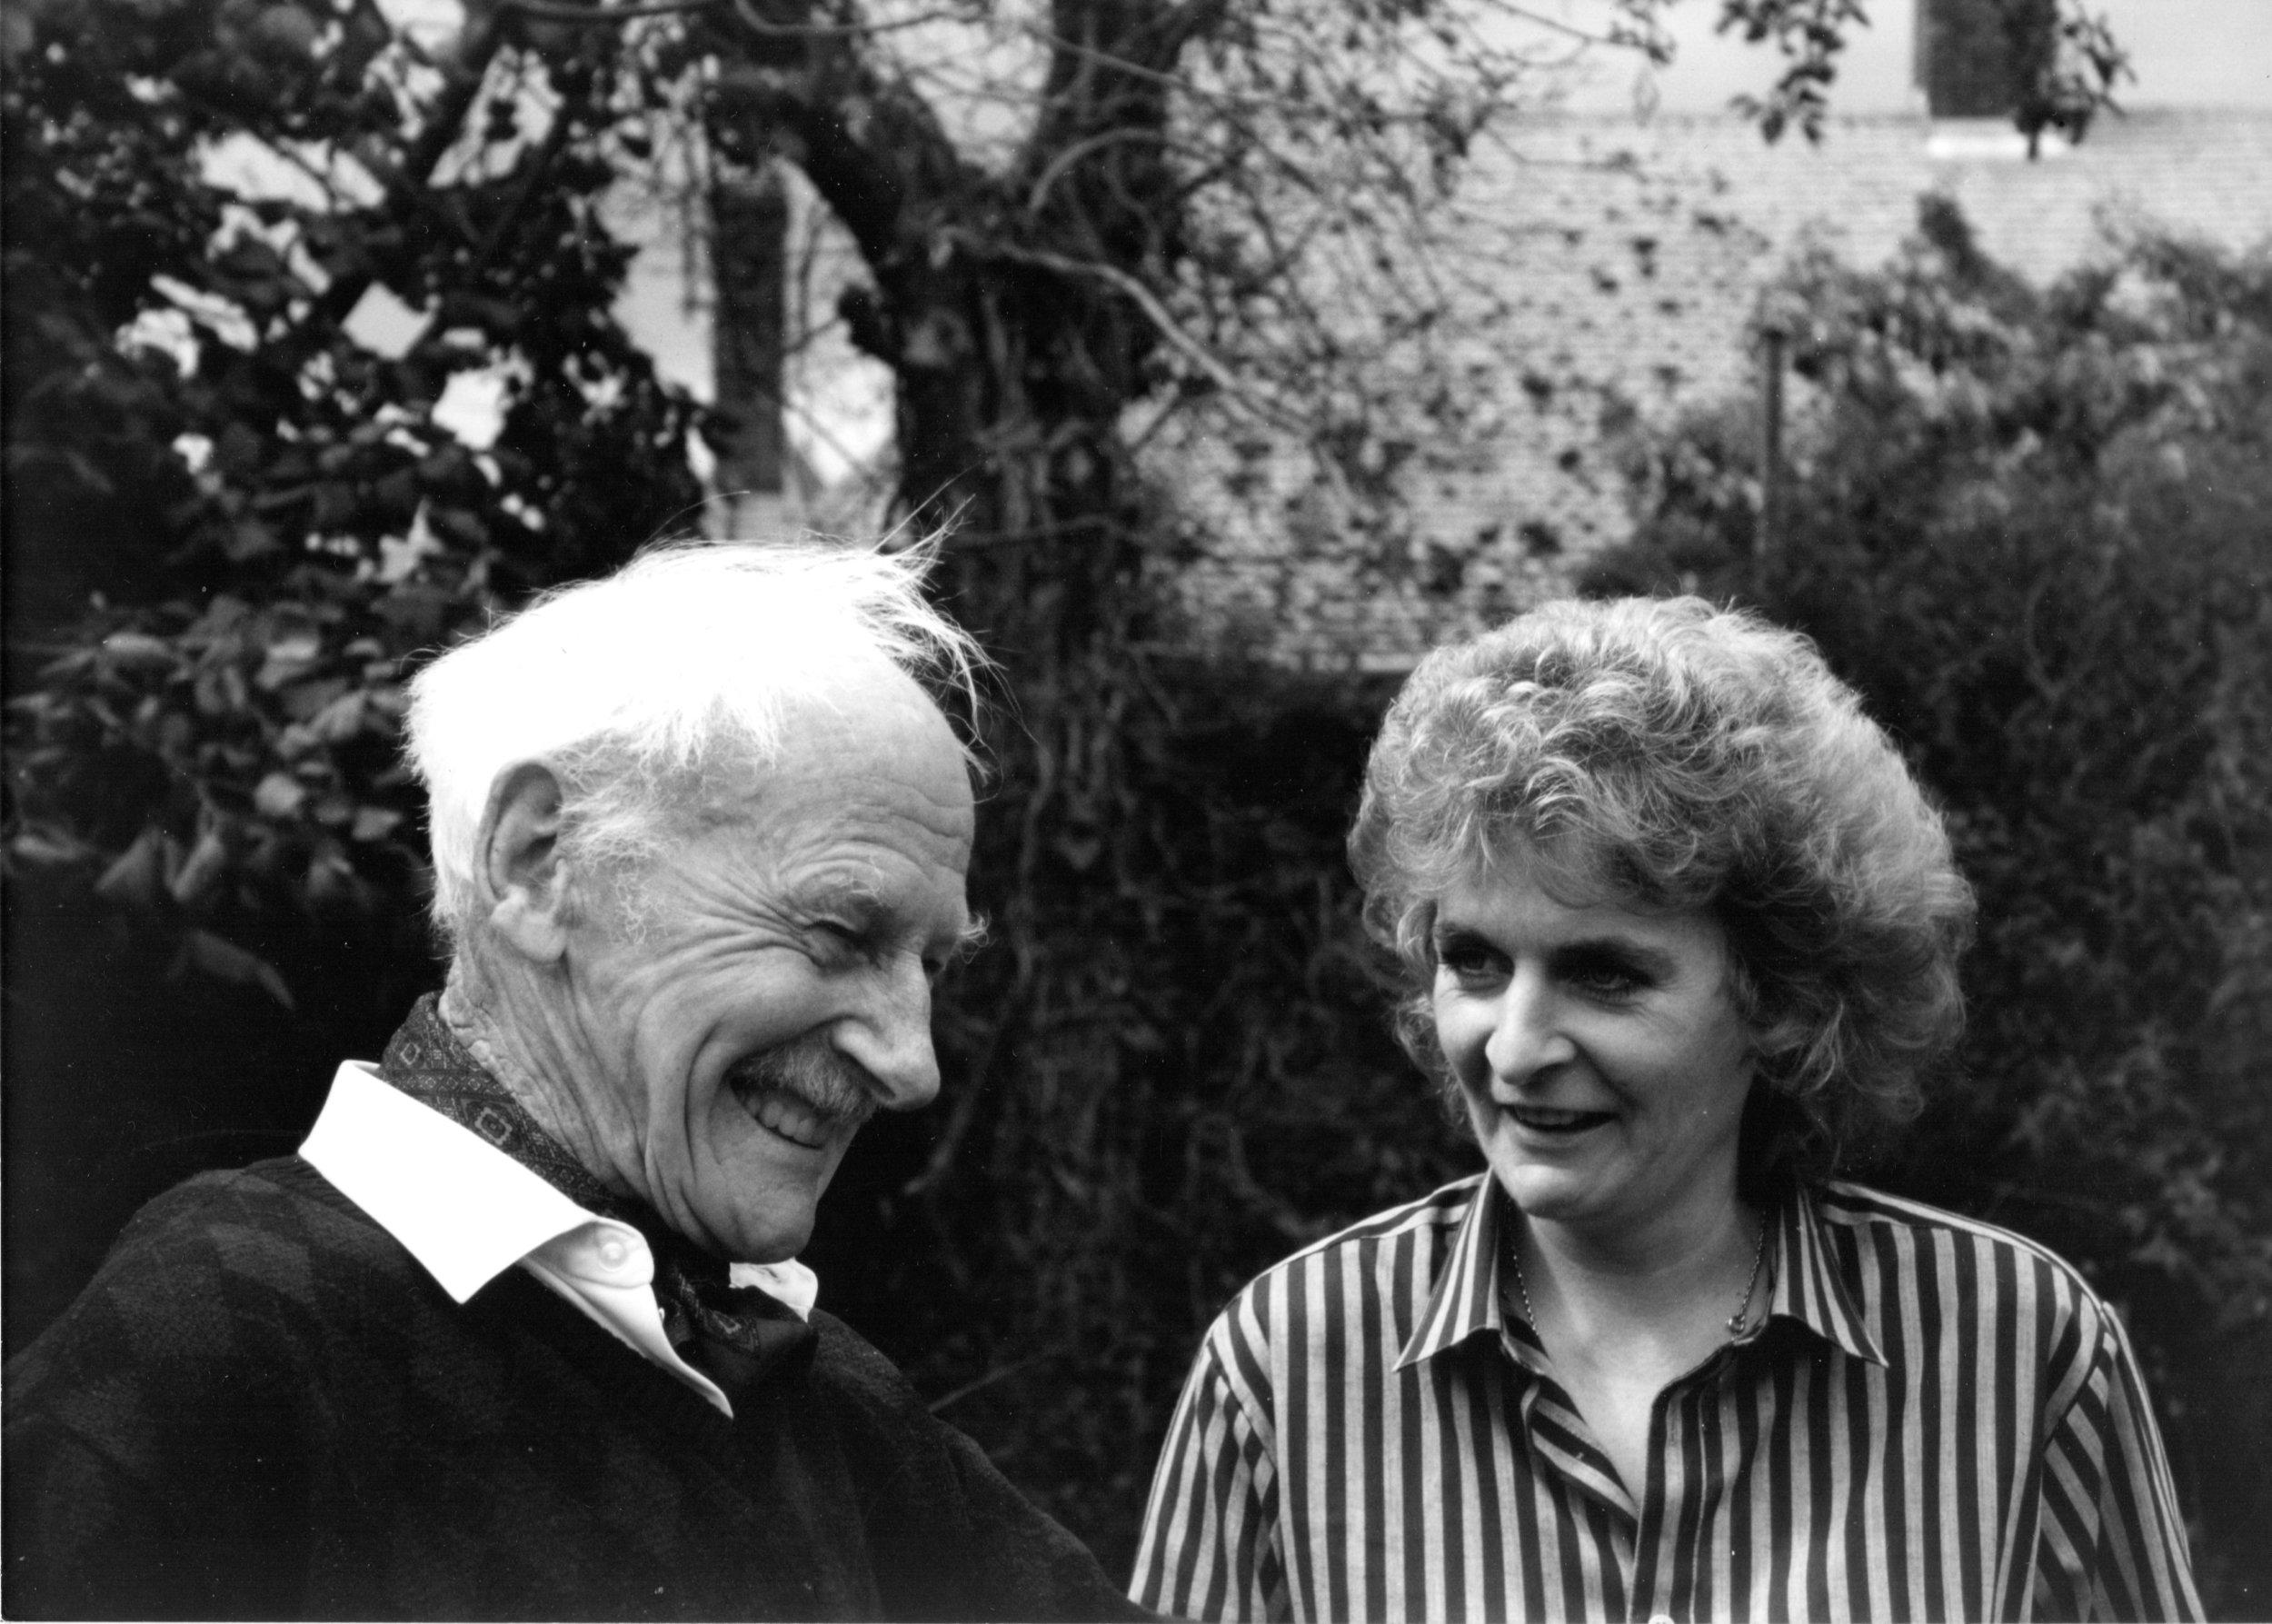 Harry Hambling and daughter Maggi Hambling in Harry's garden, Hadleigh, Suffolk, 1980s -